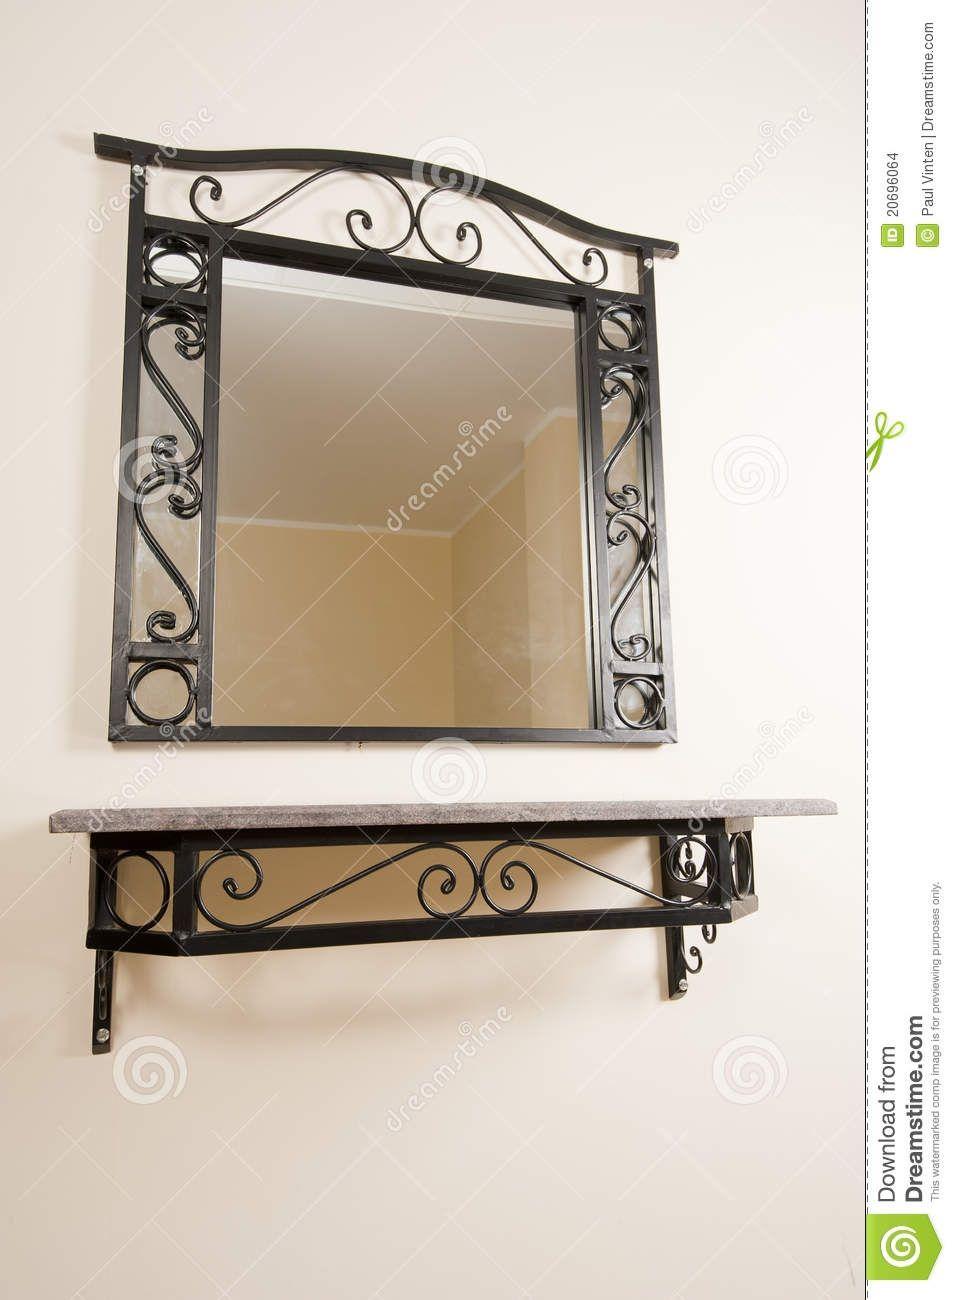 Wall mirror with shelf drrw pinterest shelves